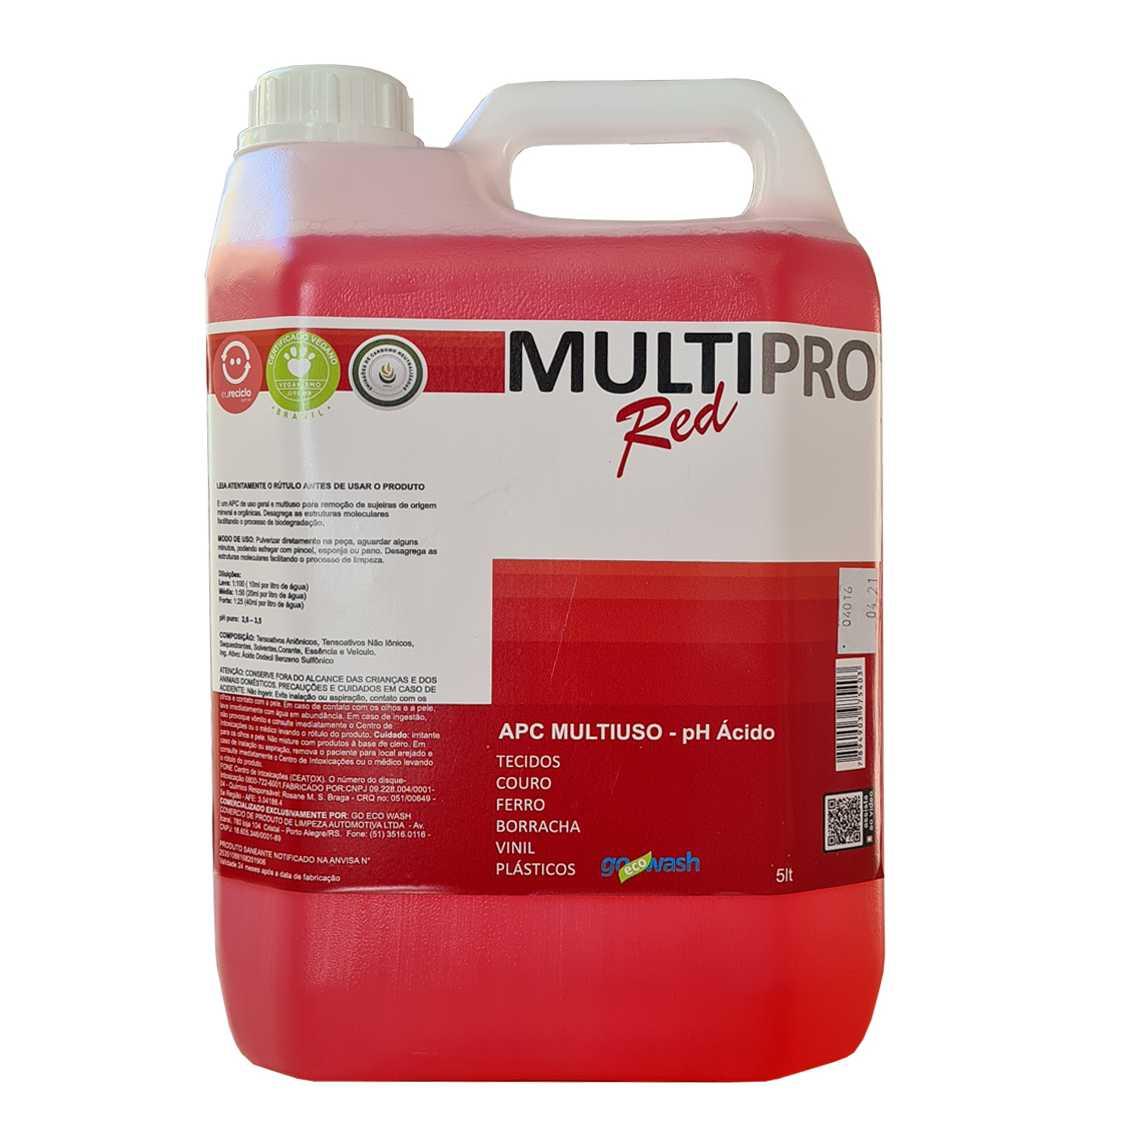 APC MultiPro RED - Limpador Multiuso Ácido 5Lt  (Go Eco Wash)  - Loja Go Eco Wash